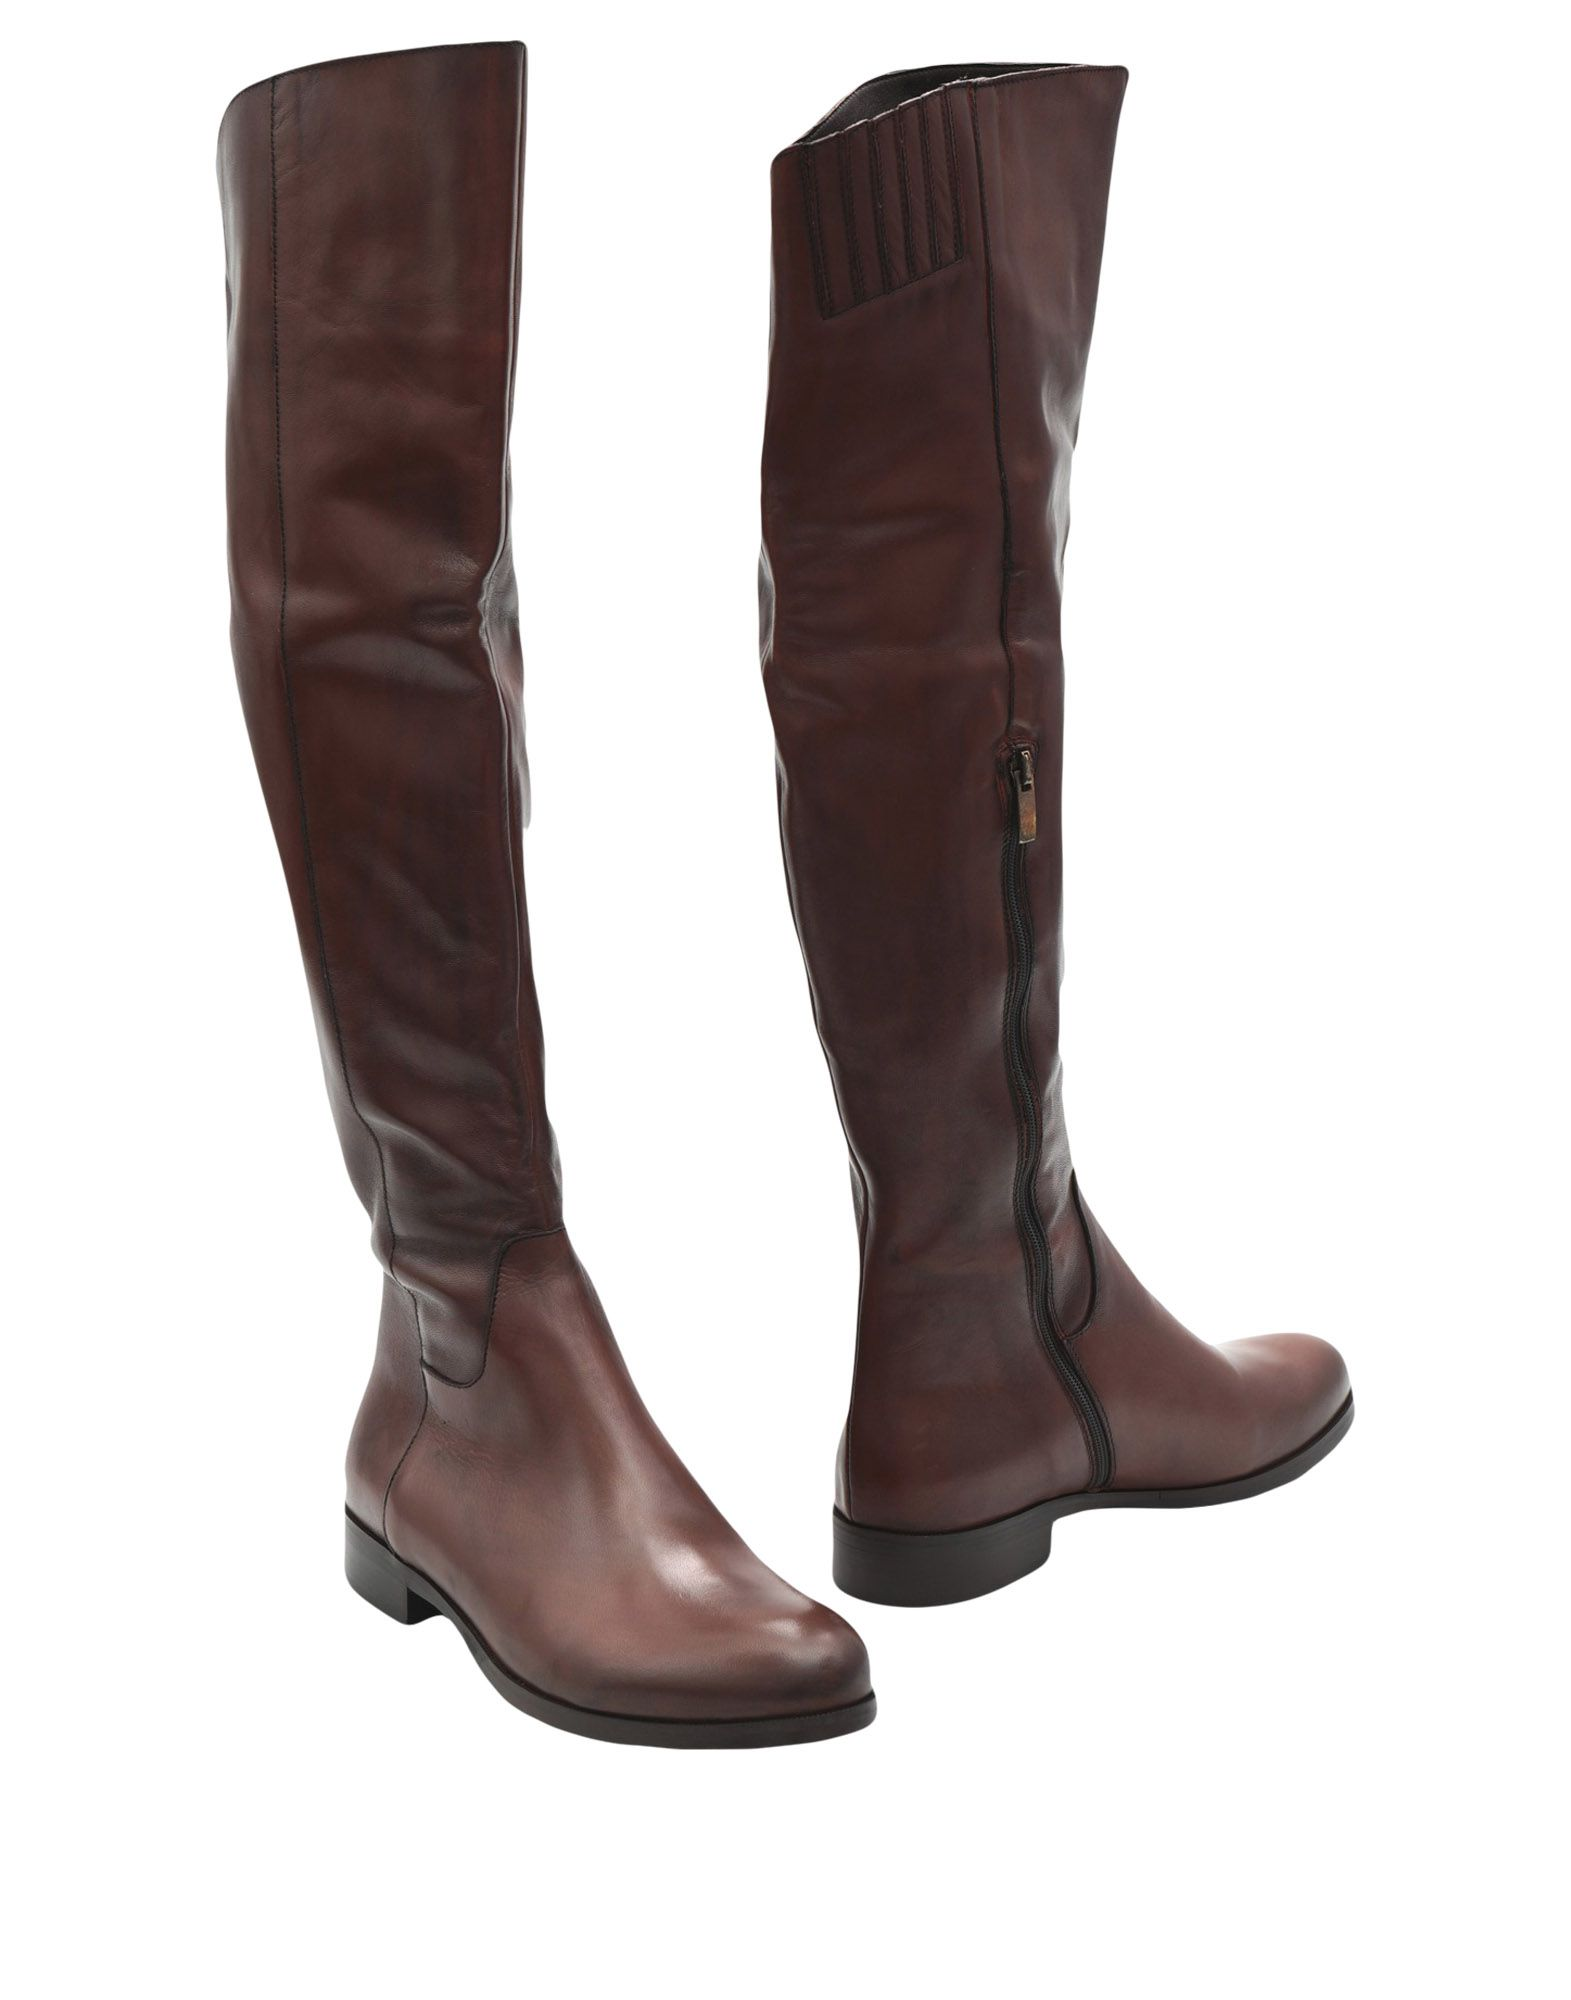 Leonardo Principi Stiefel Damen  11537626PHGut aussehende strapazierfähige Schuhe